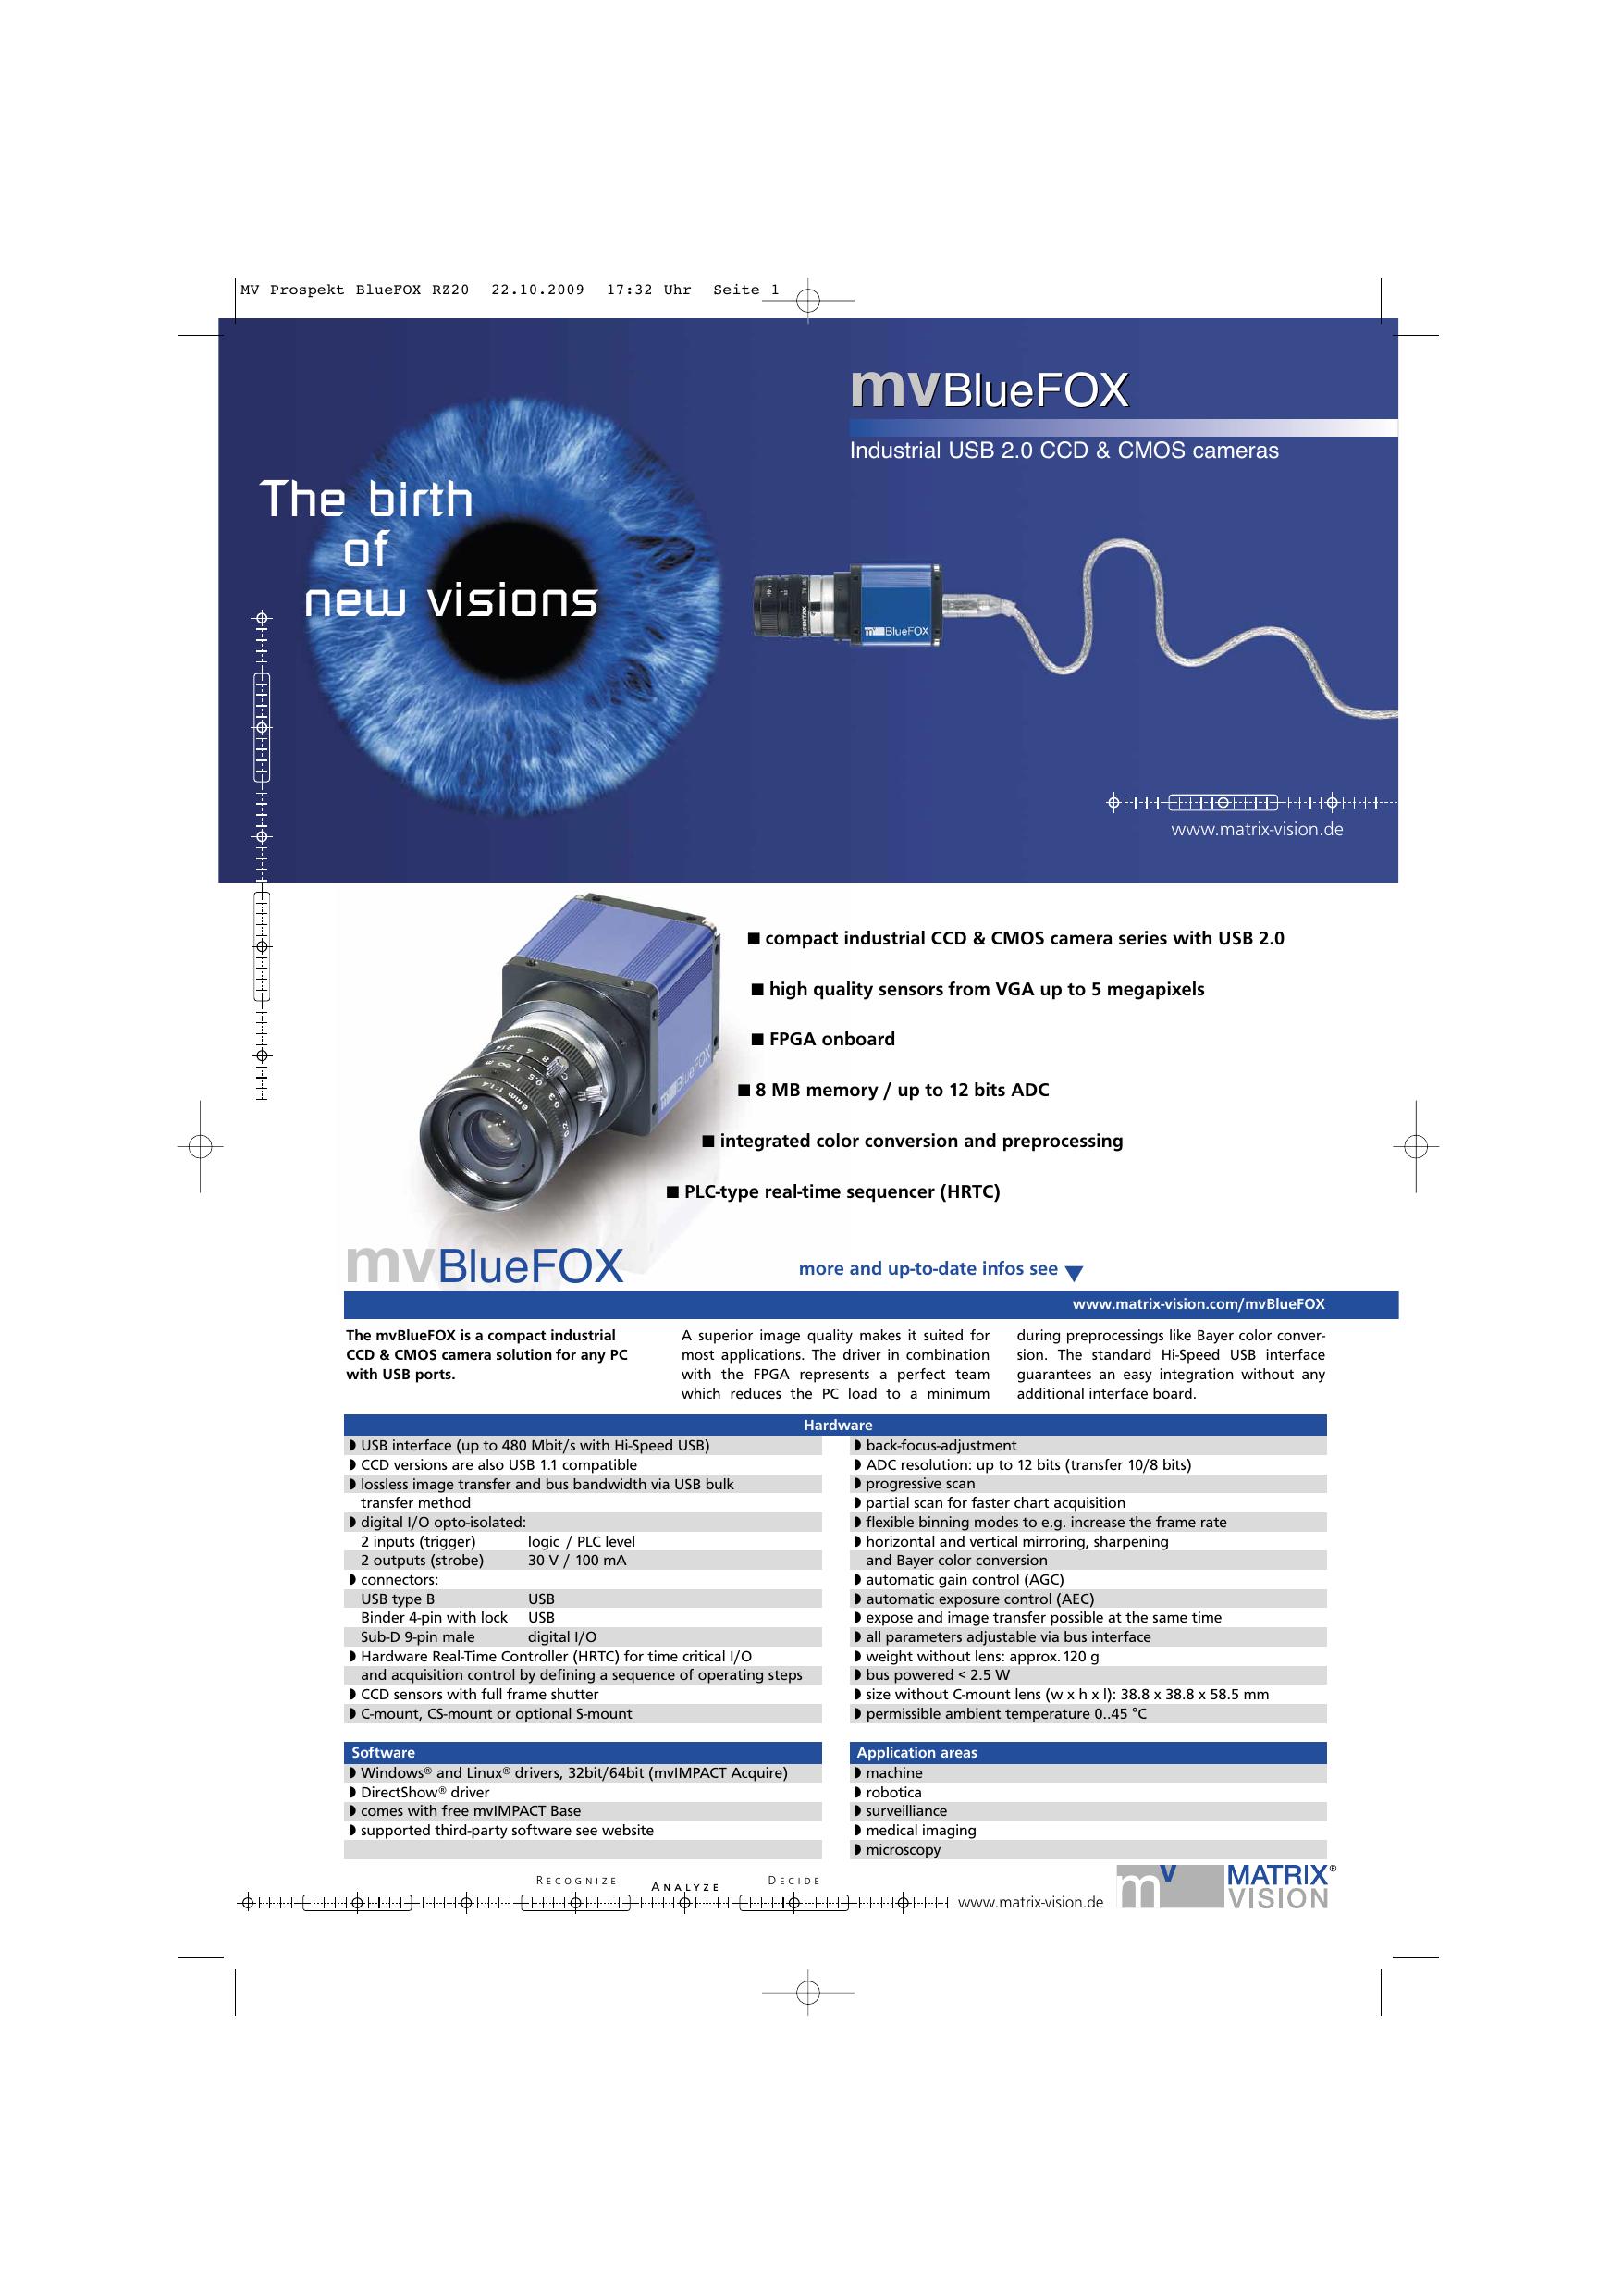 mvBlueFOX | manualzz com